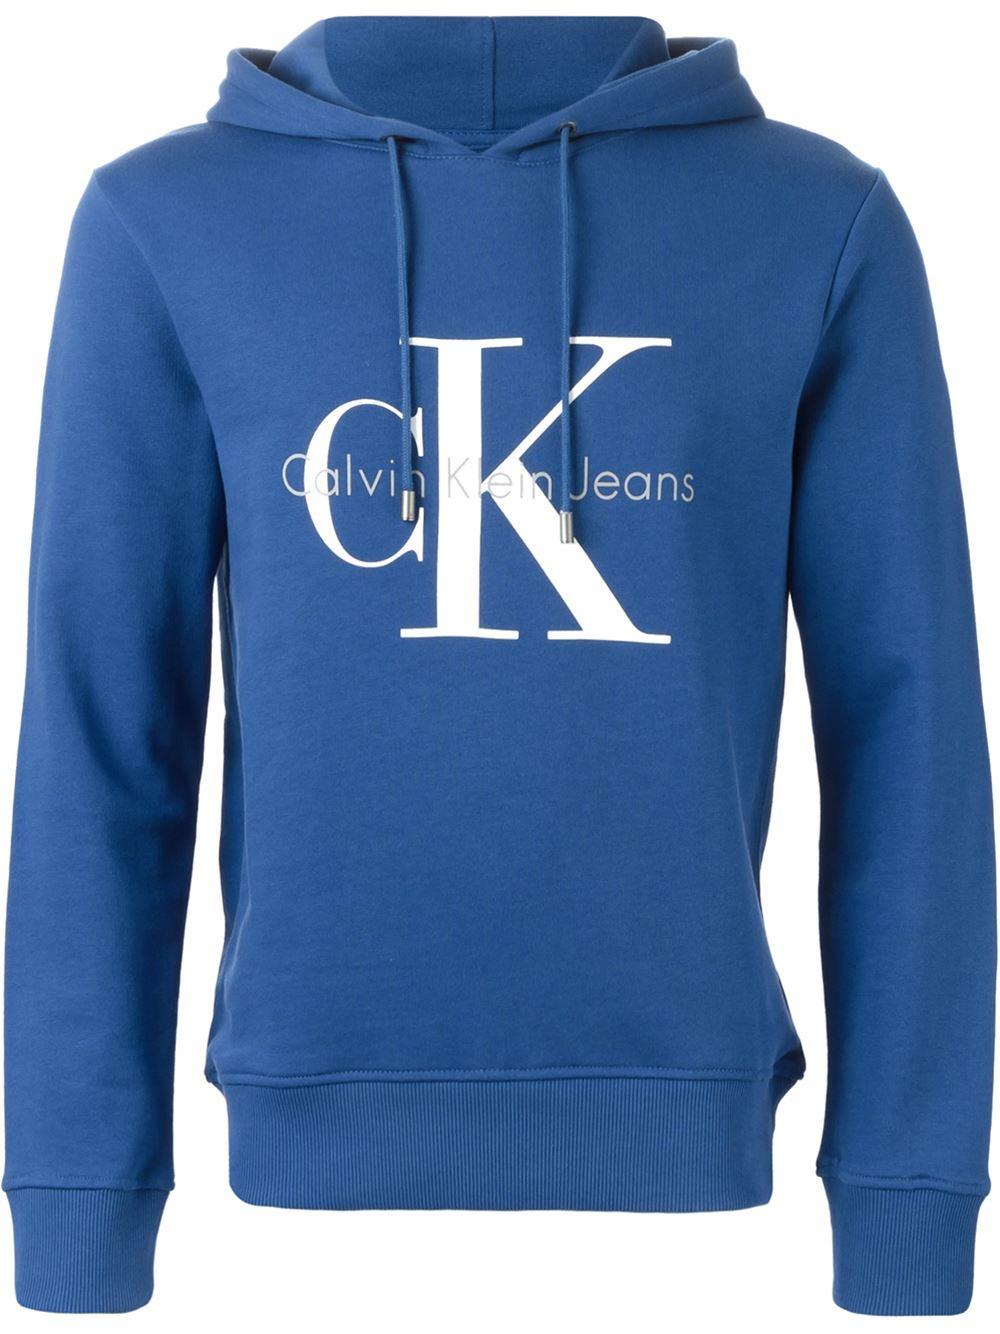 calvin klein jeans logo print hoodie in blue for men lyst. Black Bedroom Furniture Sets. Home Design Ideas